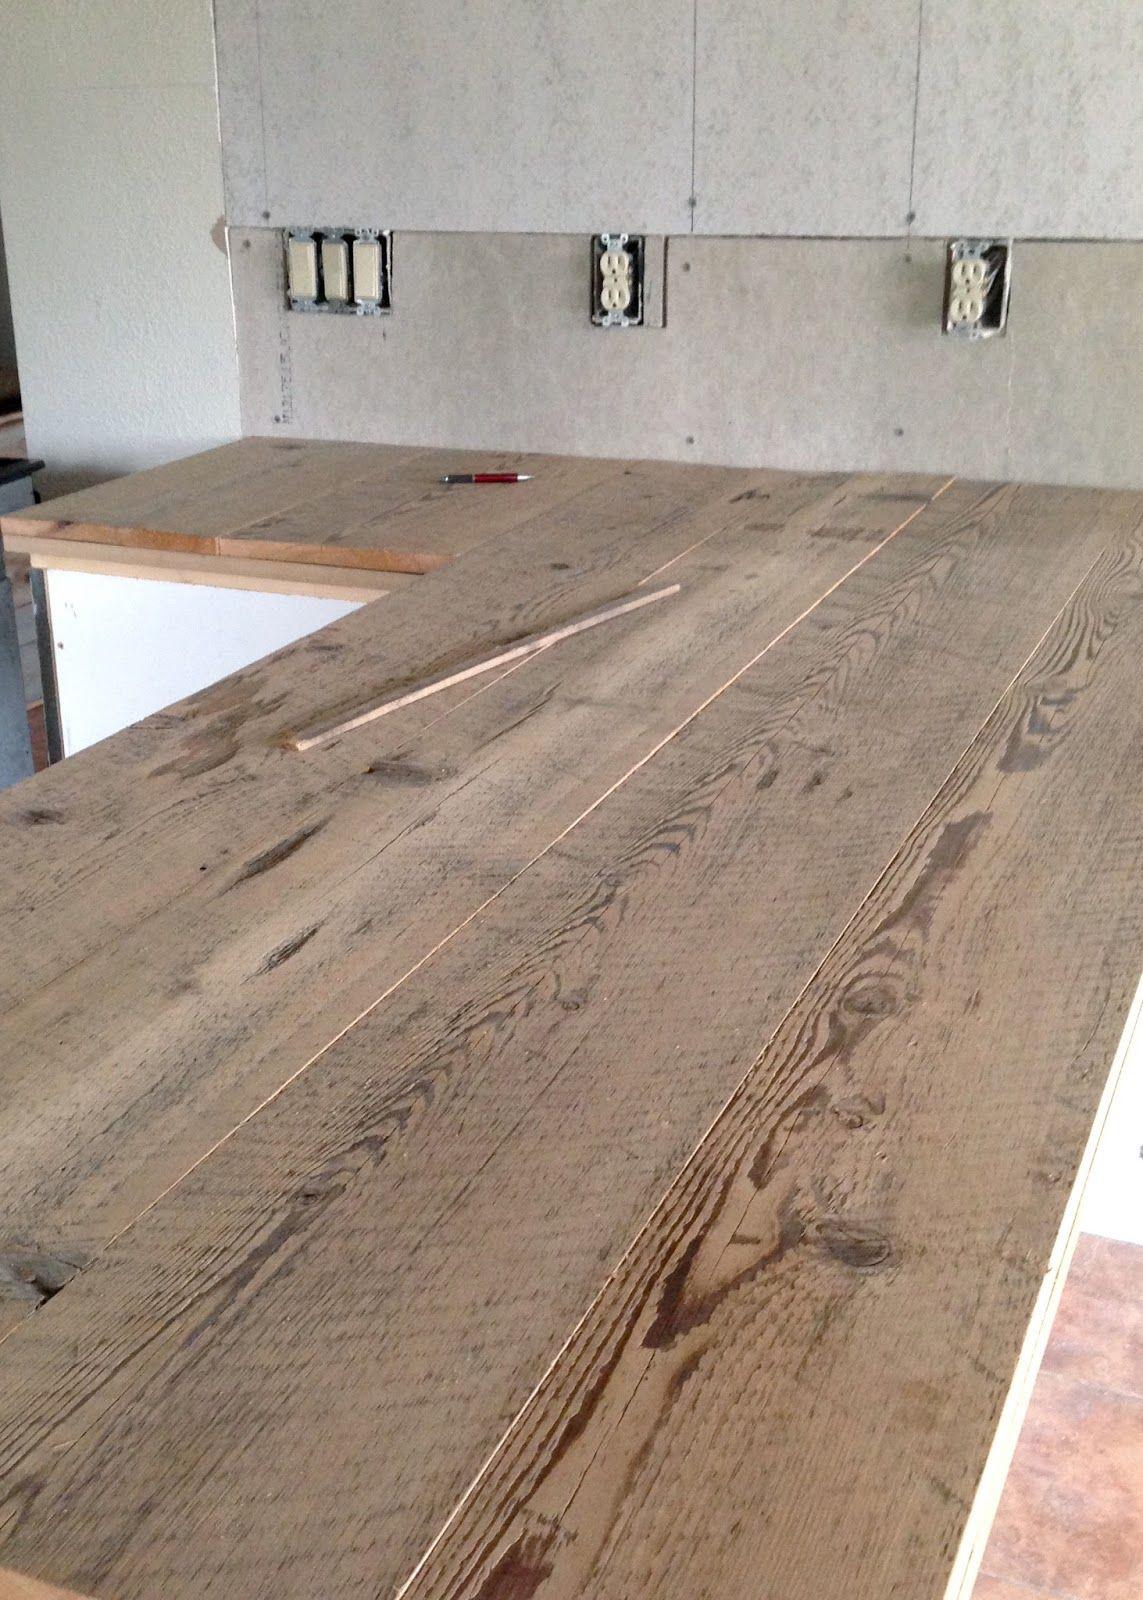 hardwood floor refinishing everett wa of amoy aldamashky aaldamashky on pinterest for 0df8a63bf2fdbf08024ce6531d438d72